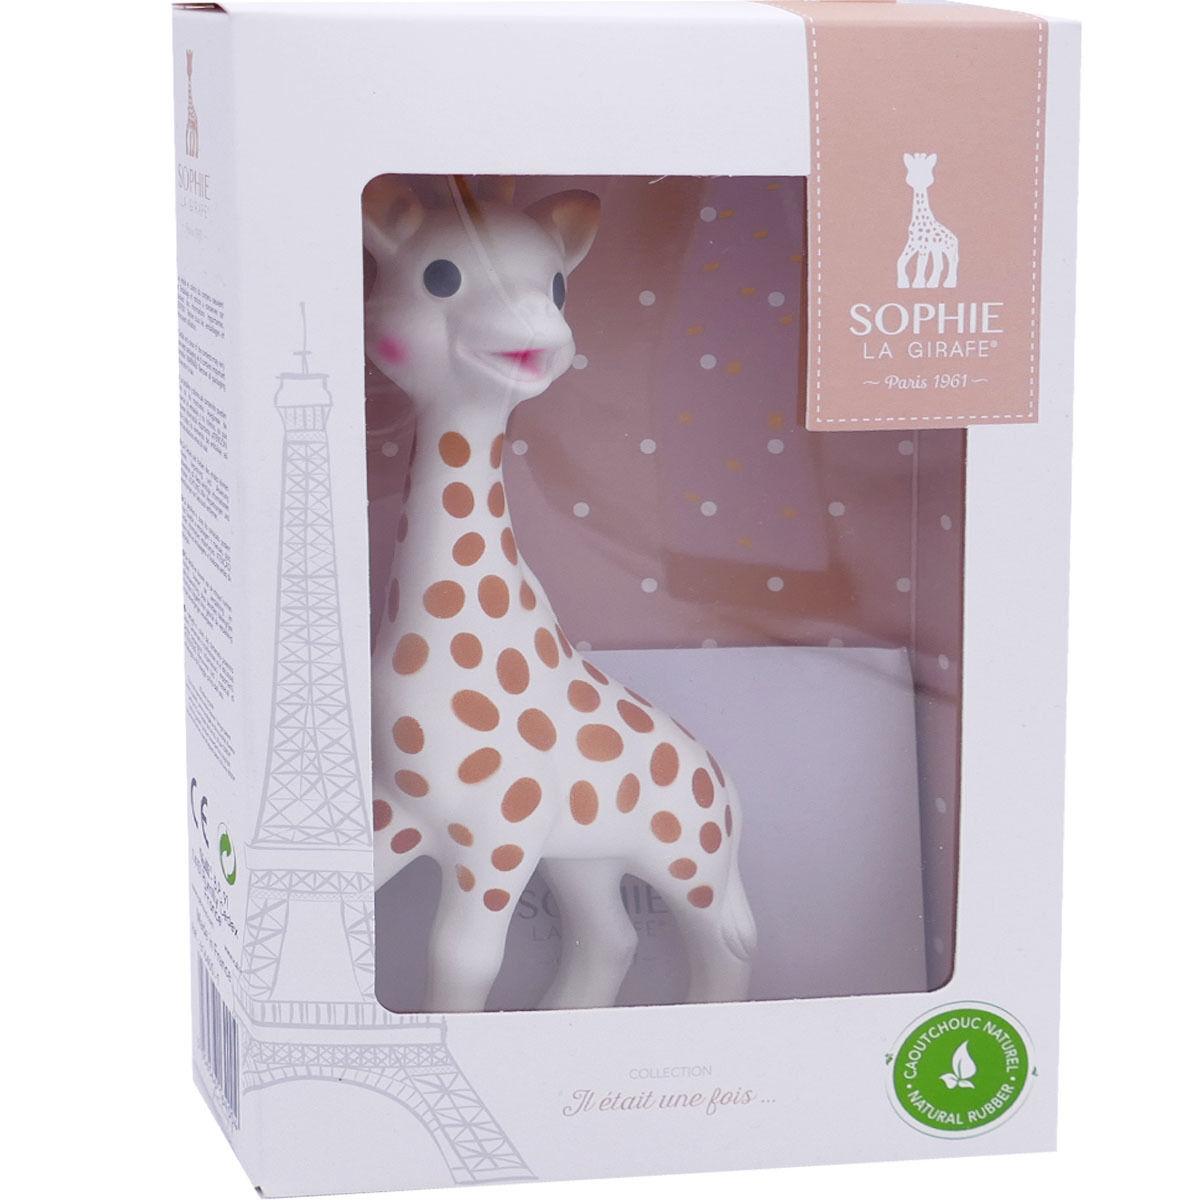 SOPHIE LA GIRAFE Sophie la giraphe jouet bebe +0mois